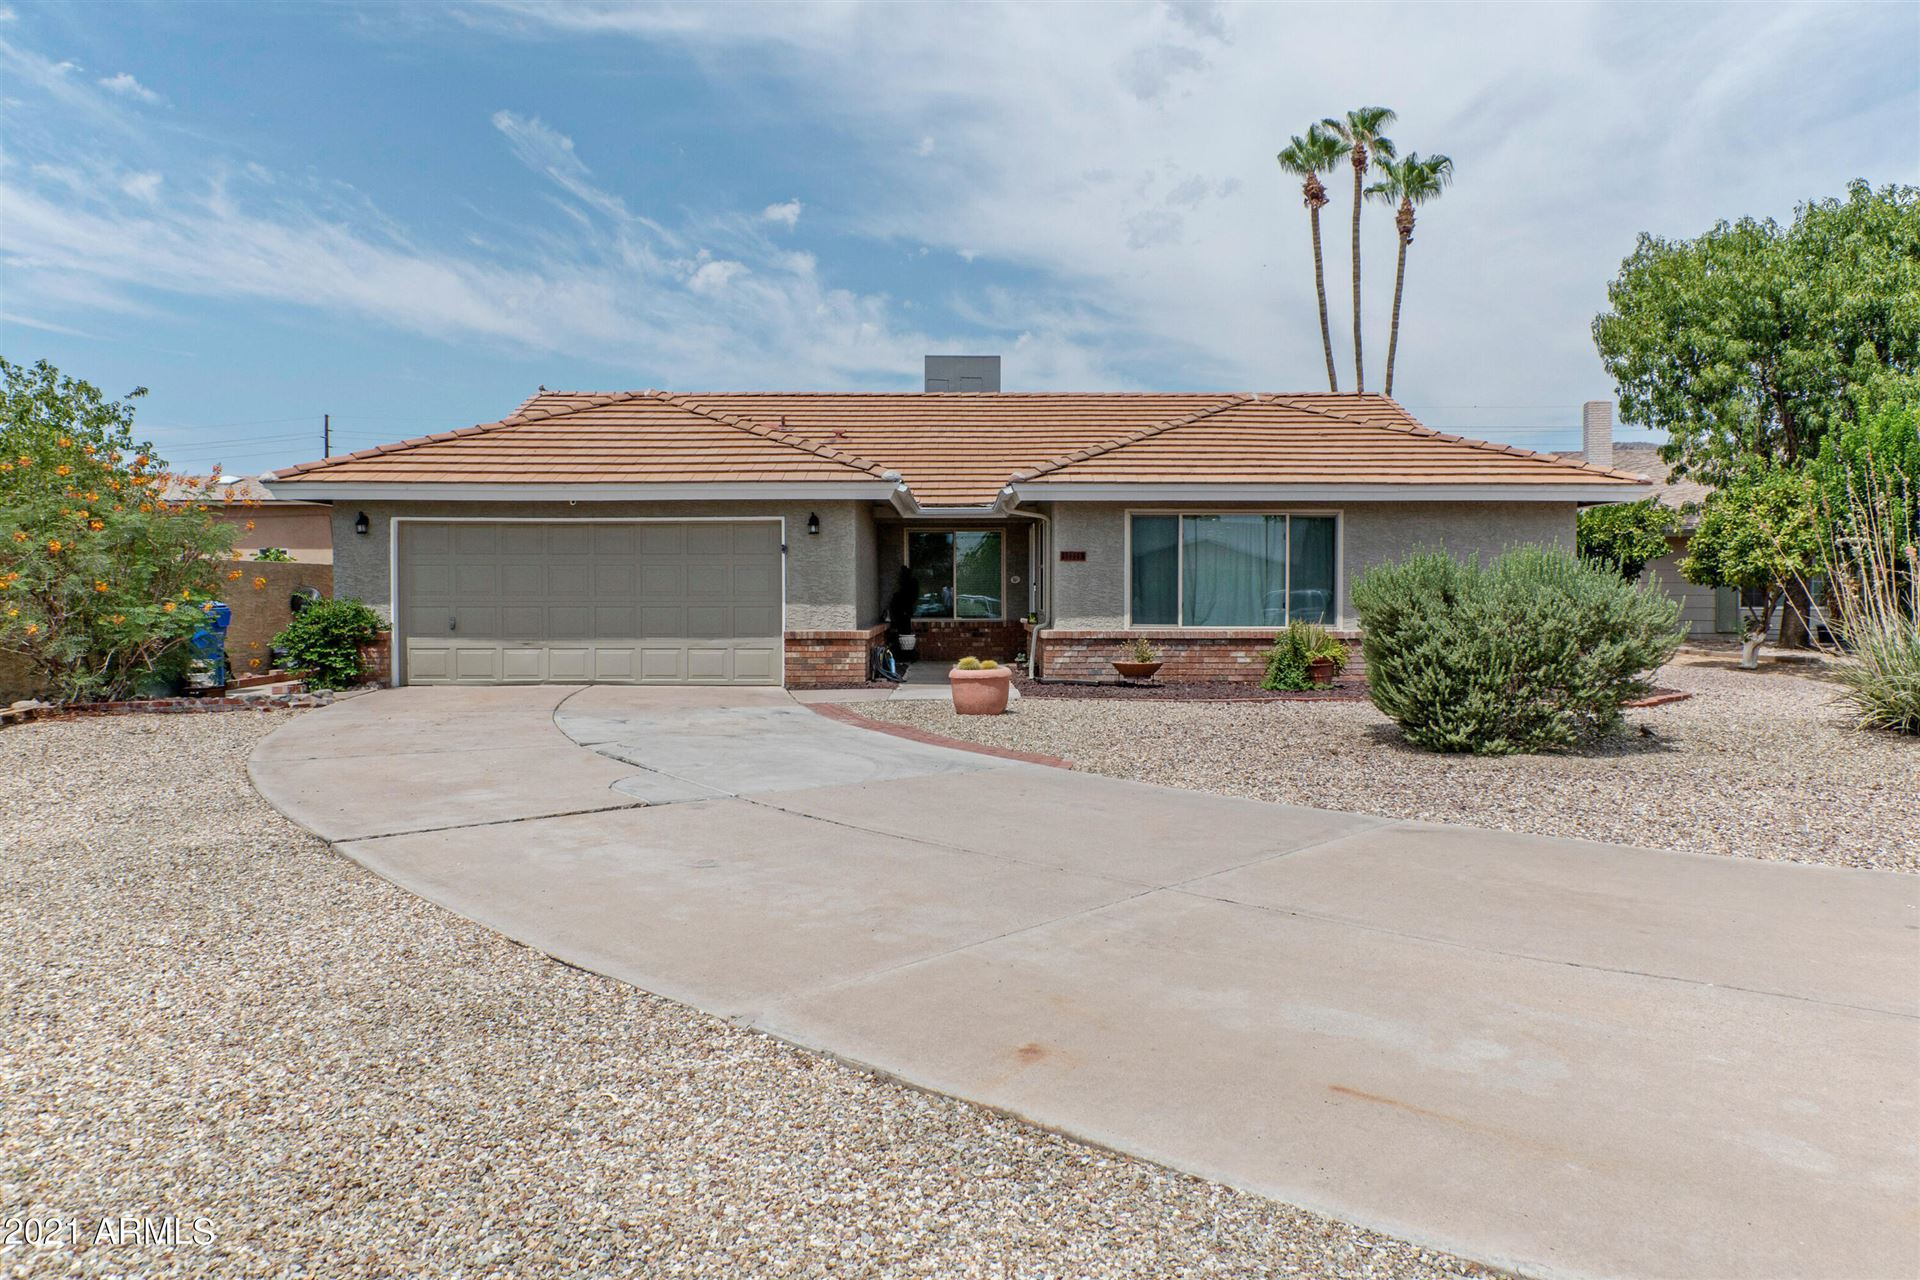 12228 S ONEIDA Street, Phoenix, AZ 85044 - MLS#: 6271352